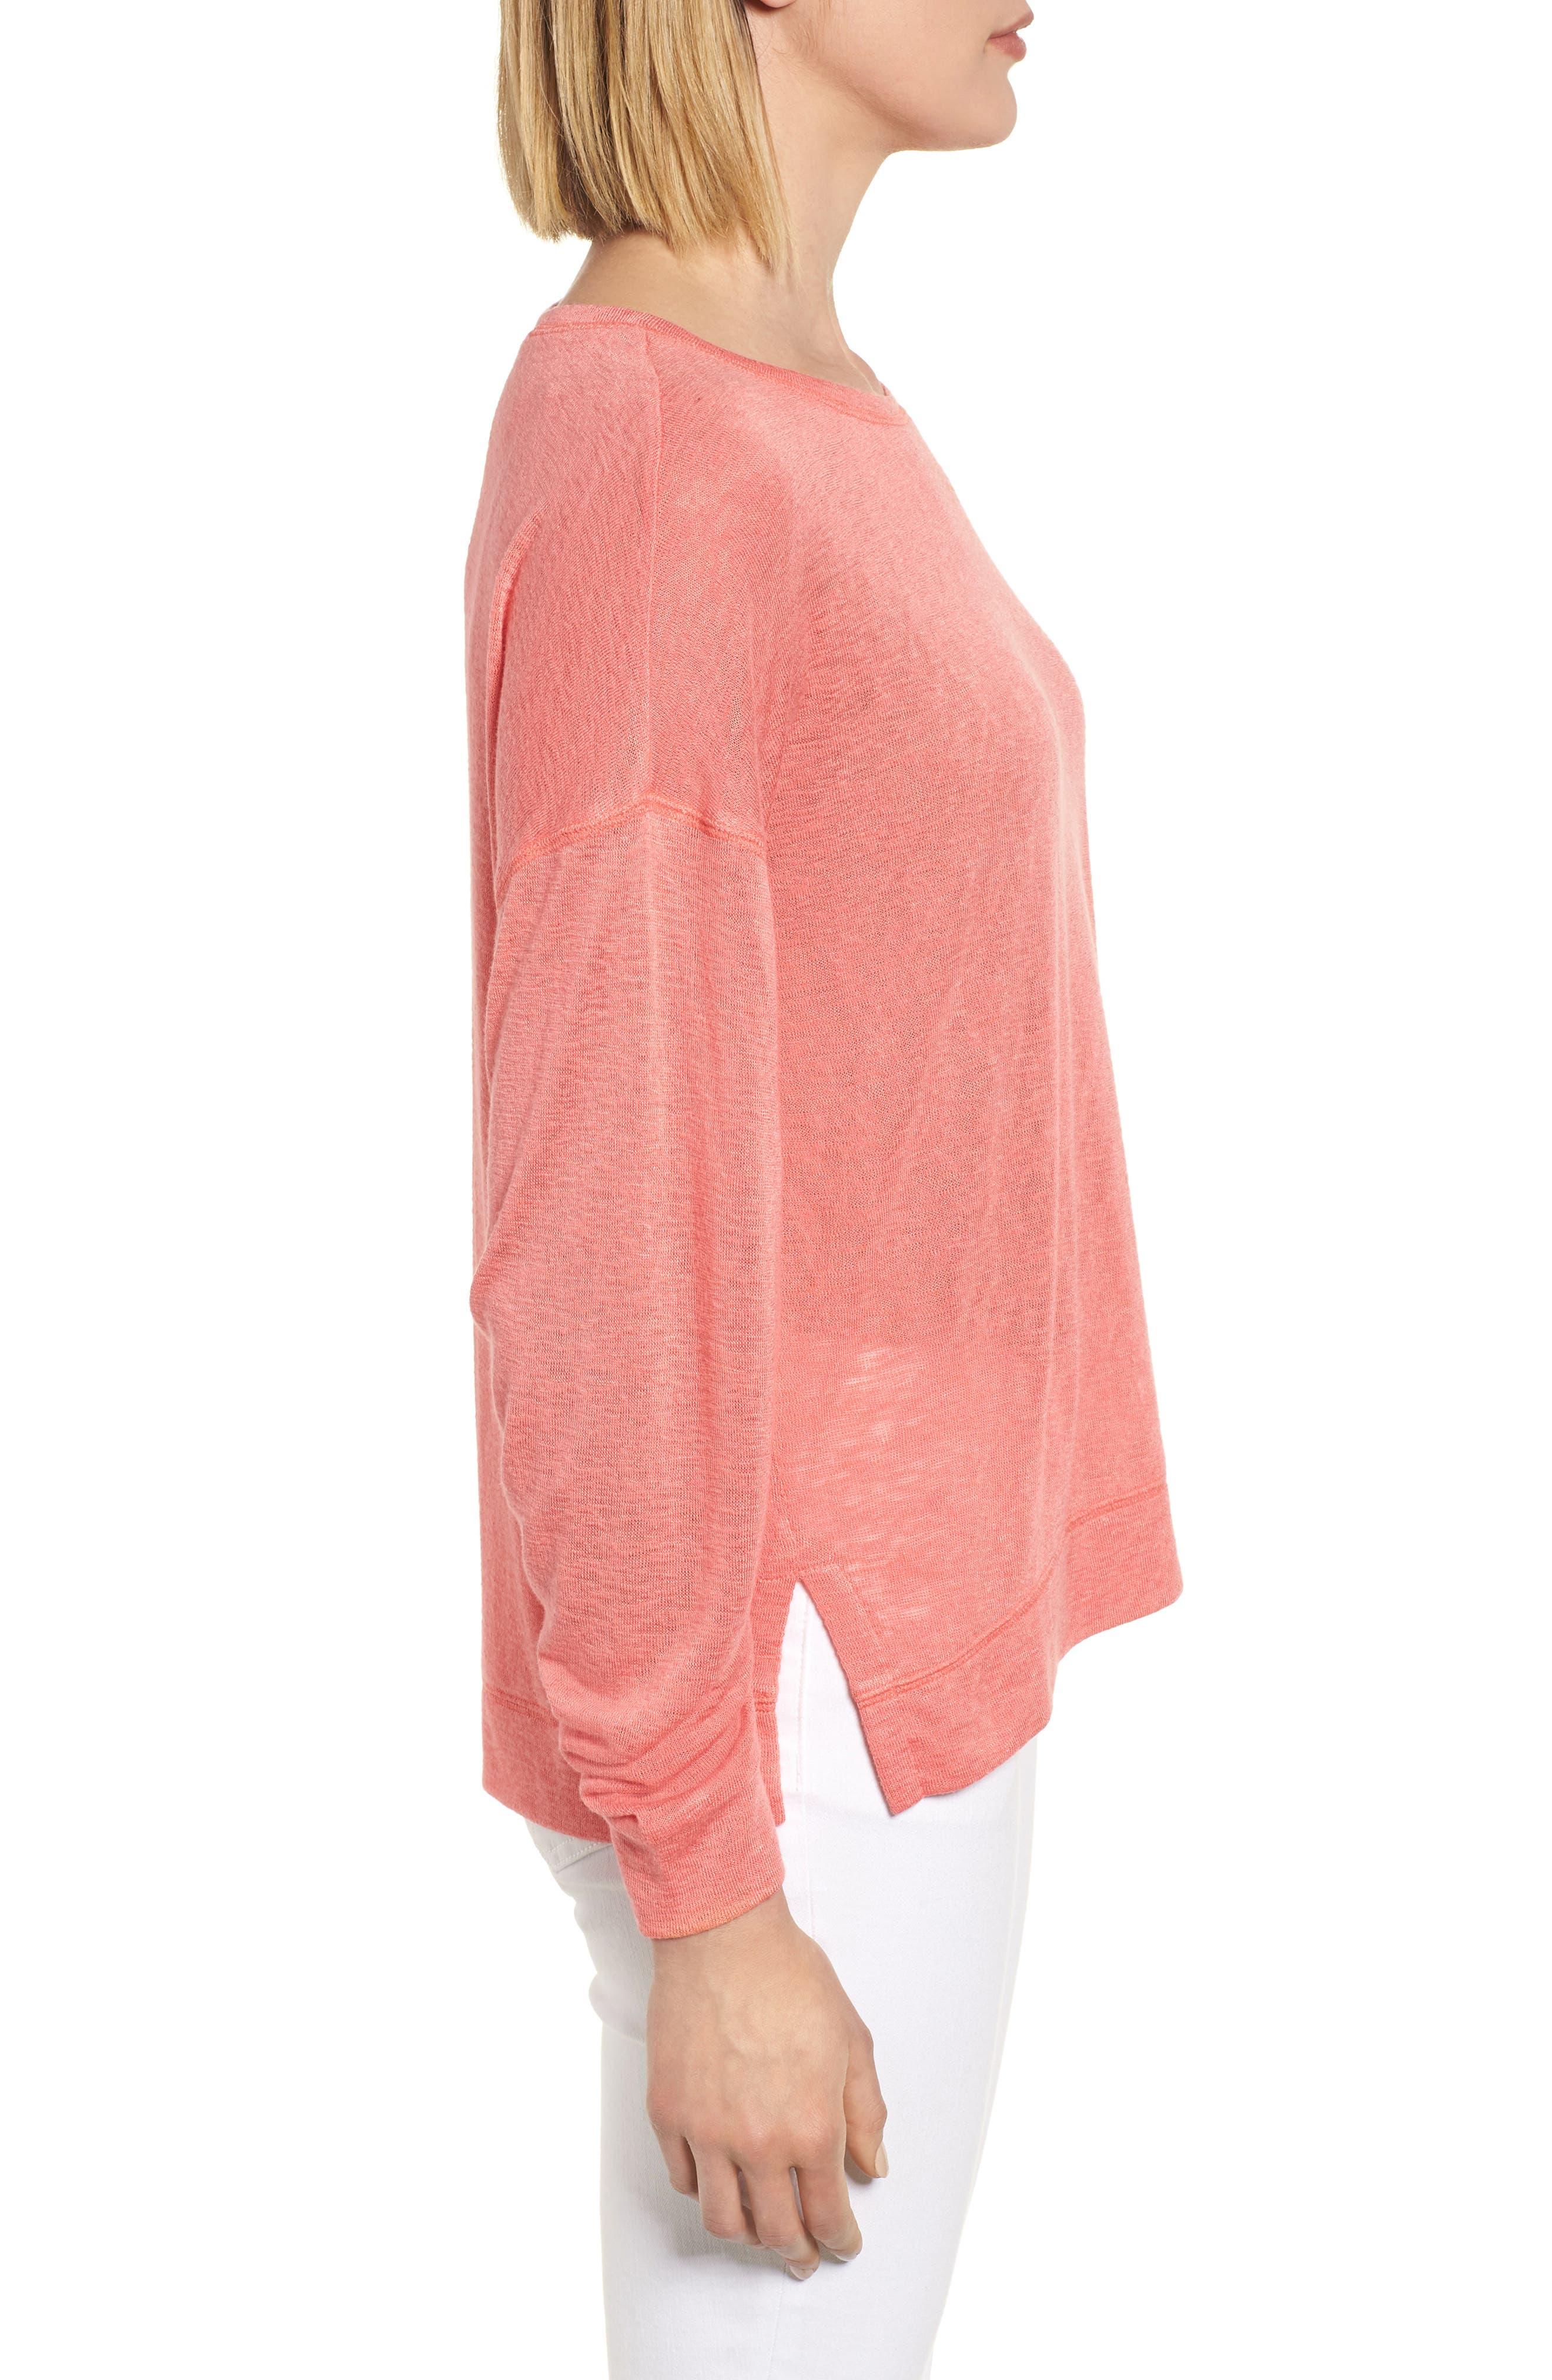 Tuck Sleeve Sweatshirt,                             Alternate thumbnail 3, color,                             Coral Rose